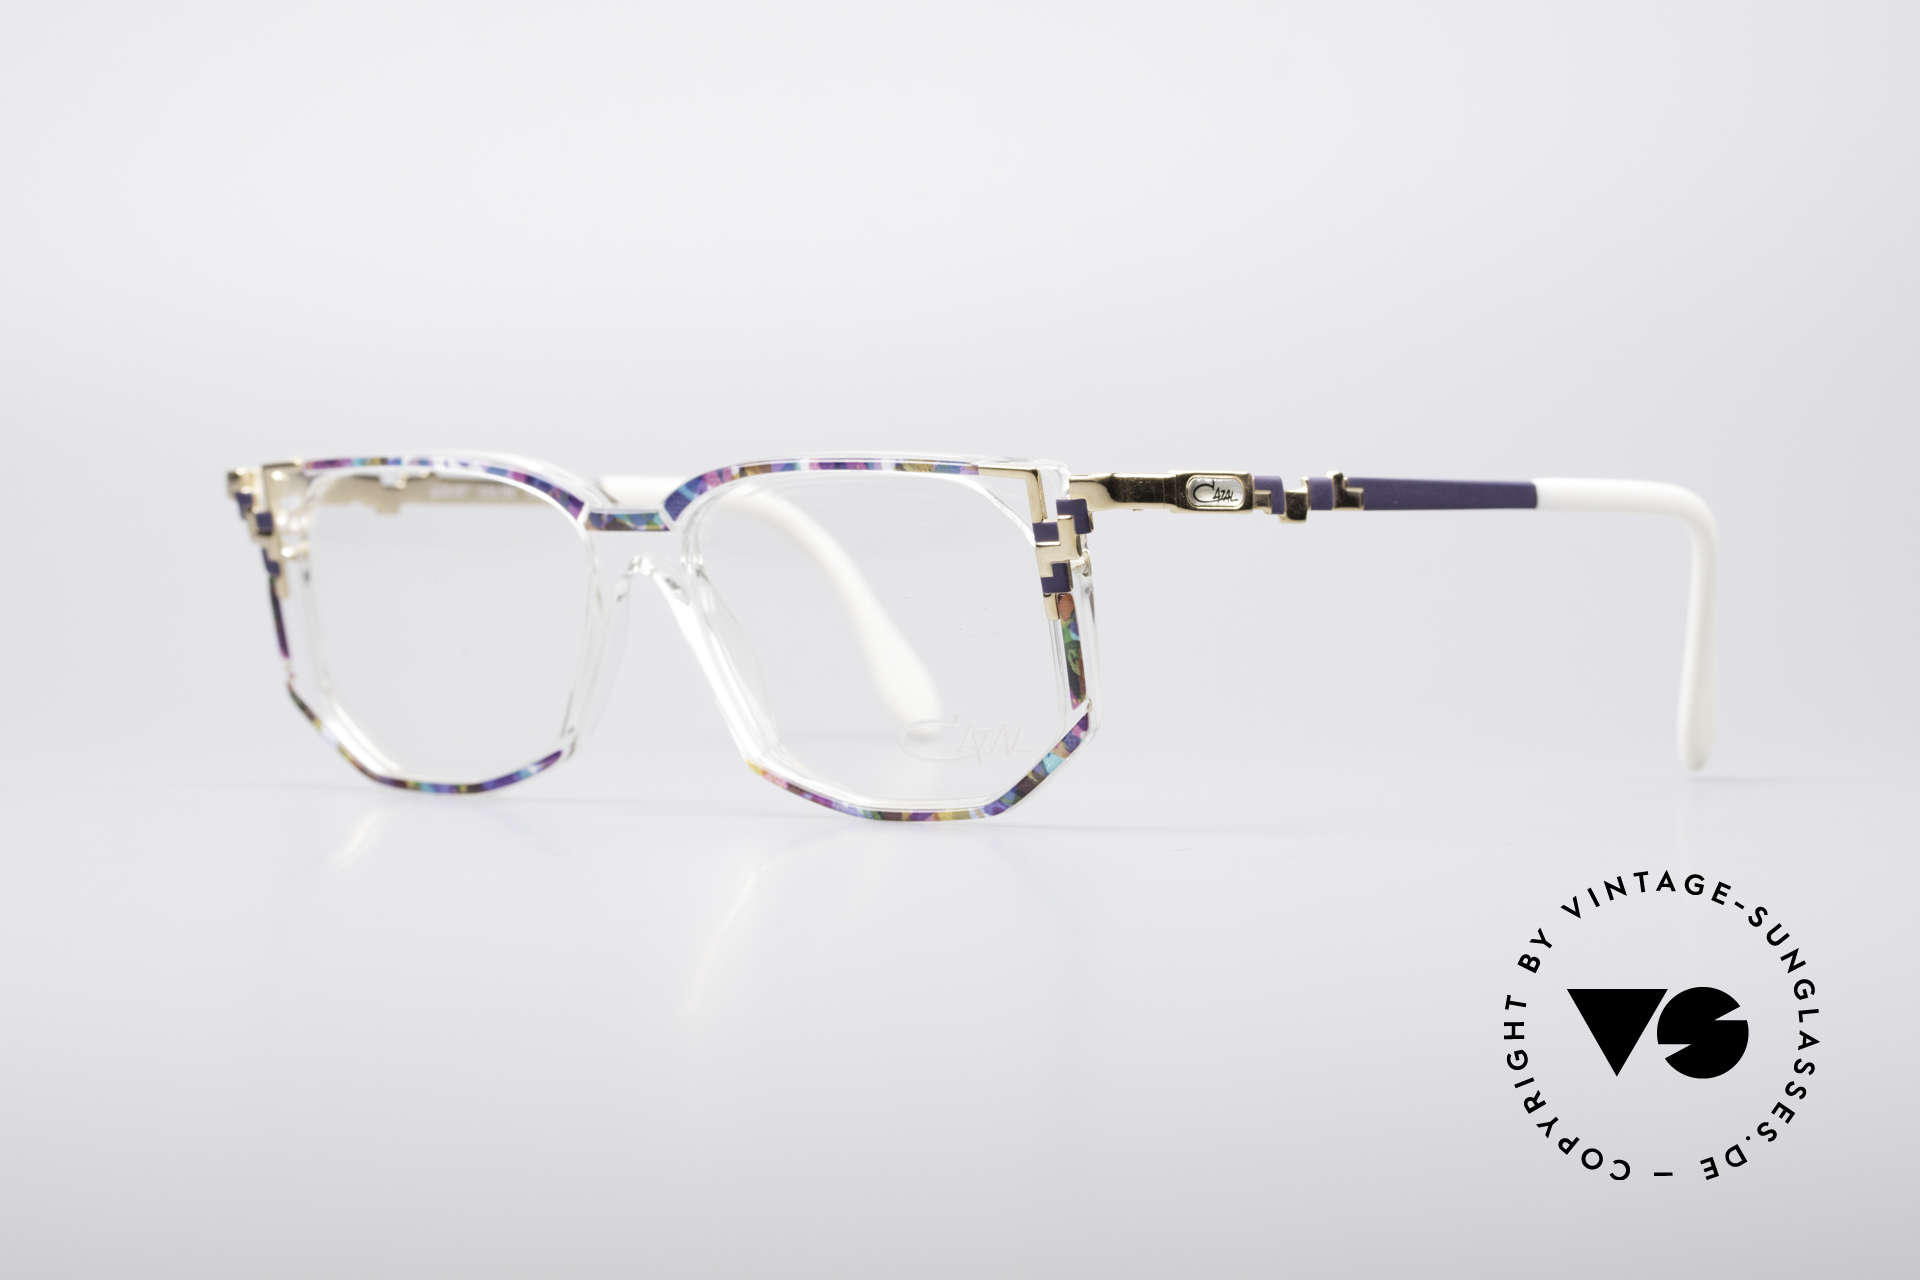 Cazal 357 Large Designer Eyeglasses, true designer piece & something really different, Made for Women